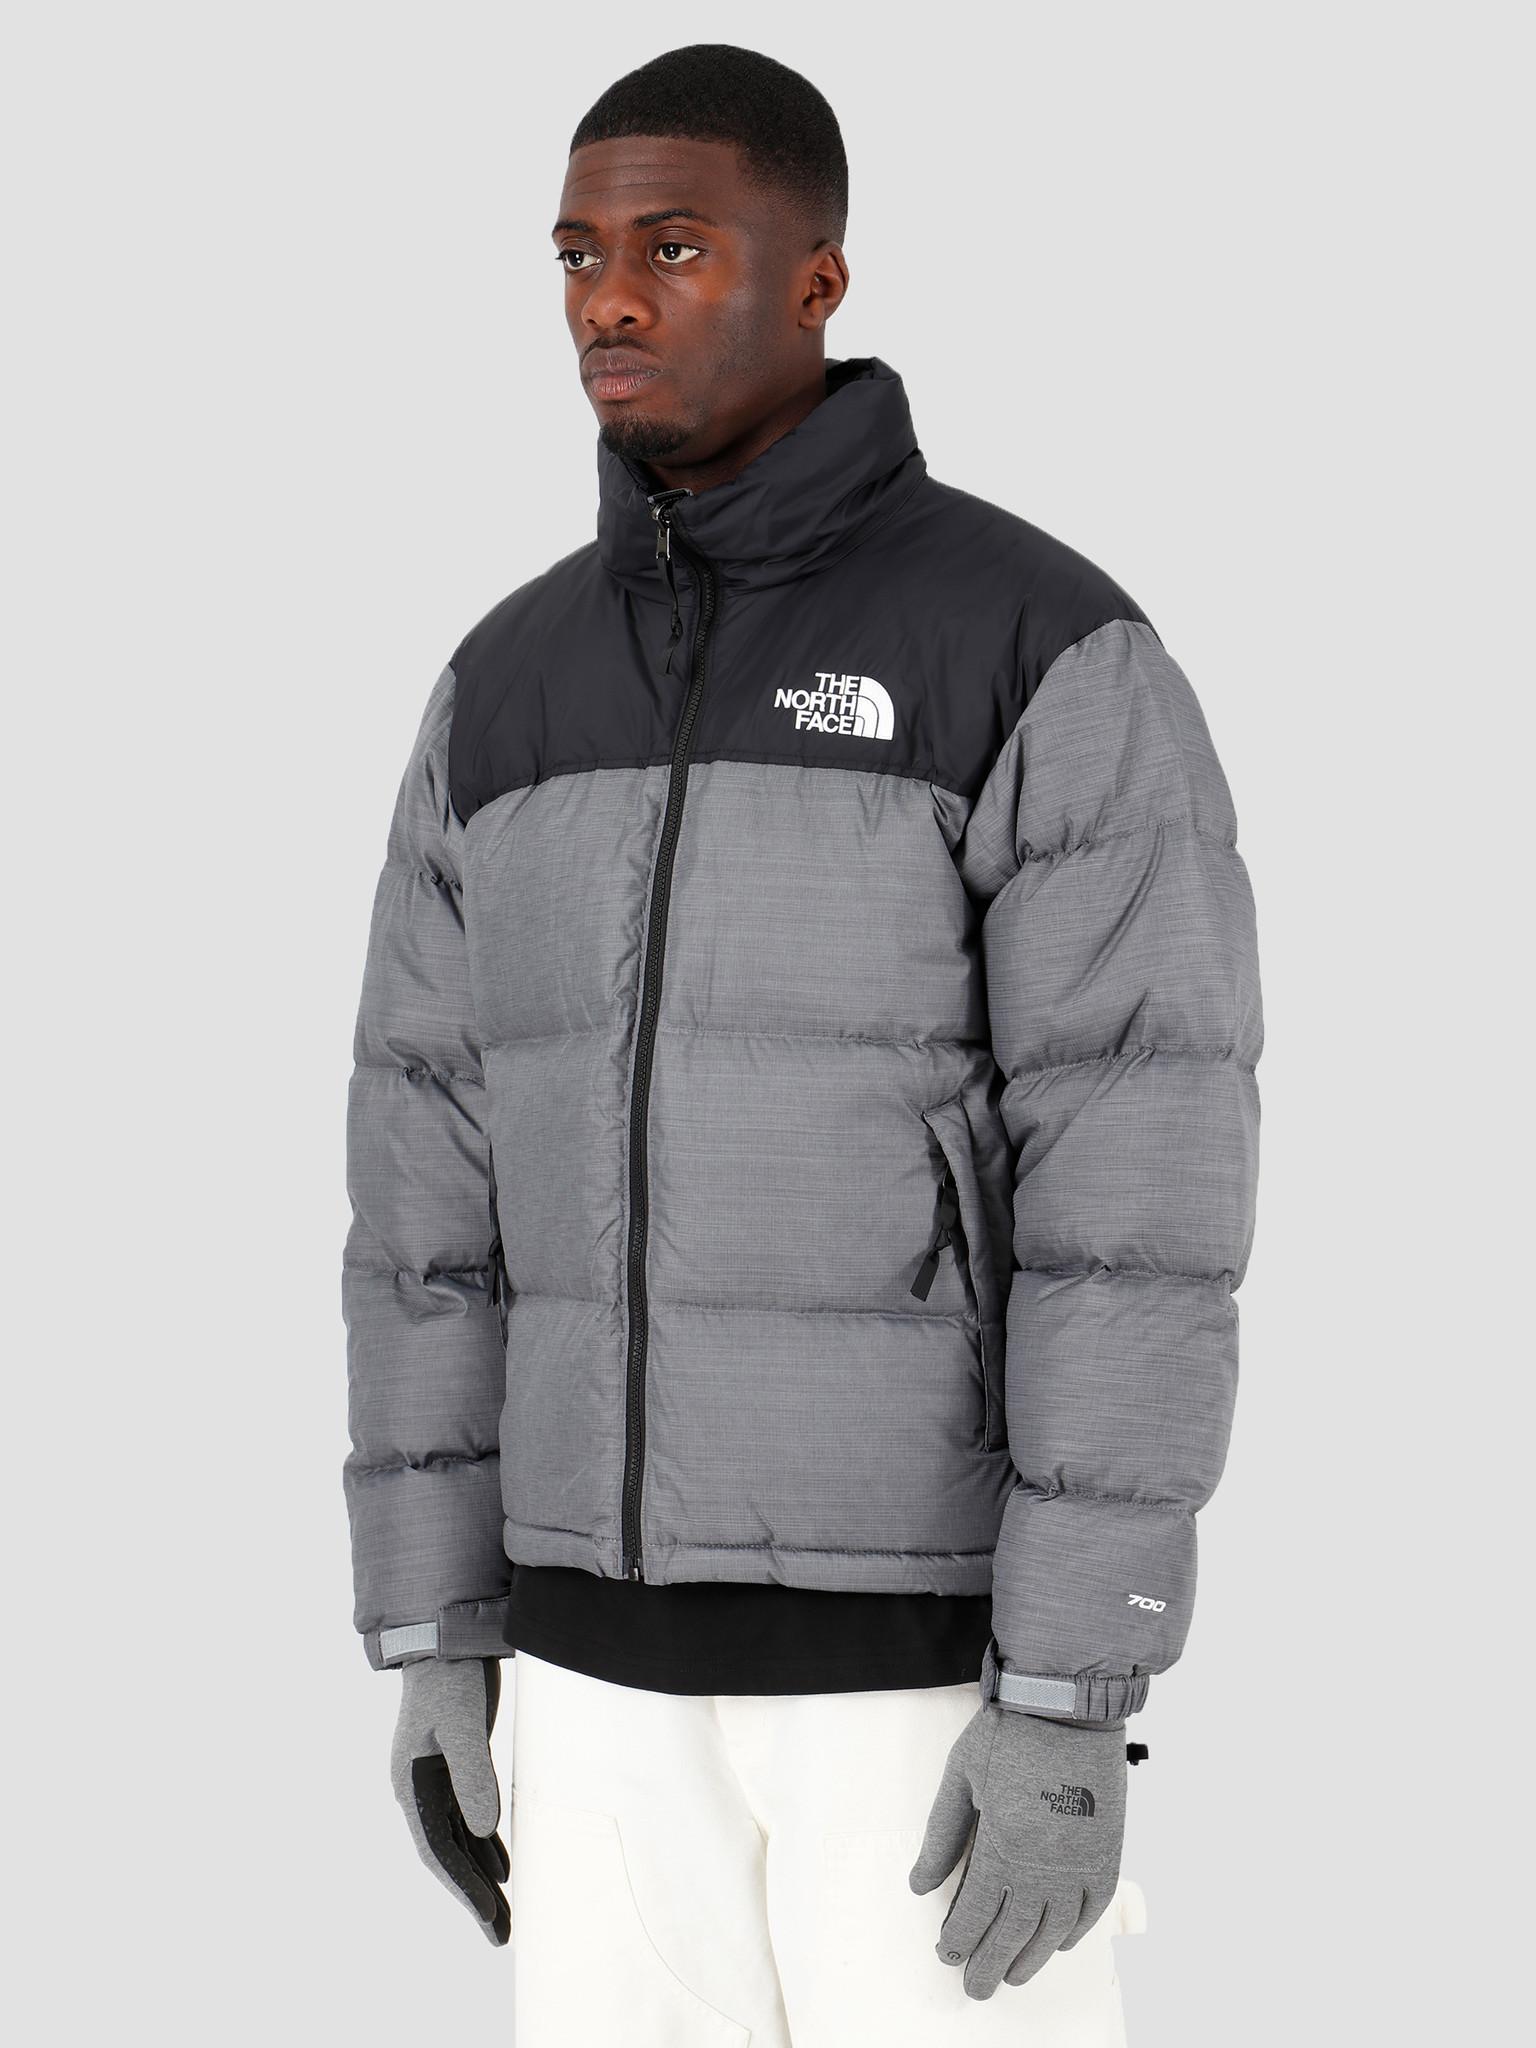 The North Face The North Face 1996 Retro Nuptse Jacket edium Grey Heather T93C8DDYY